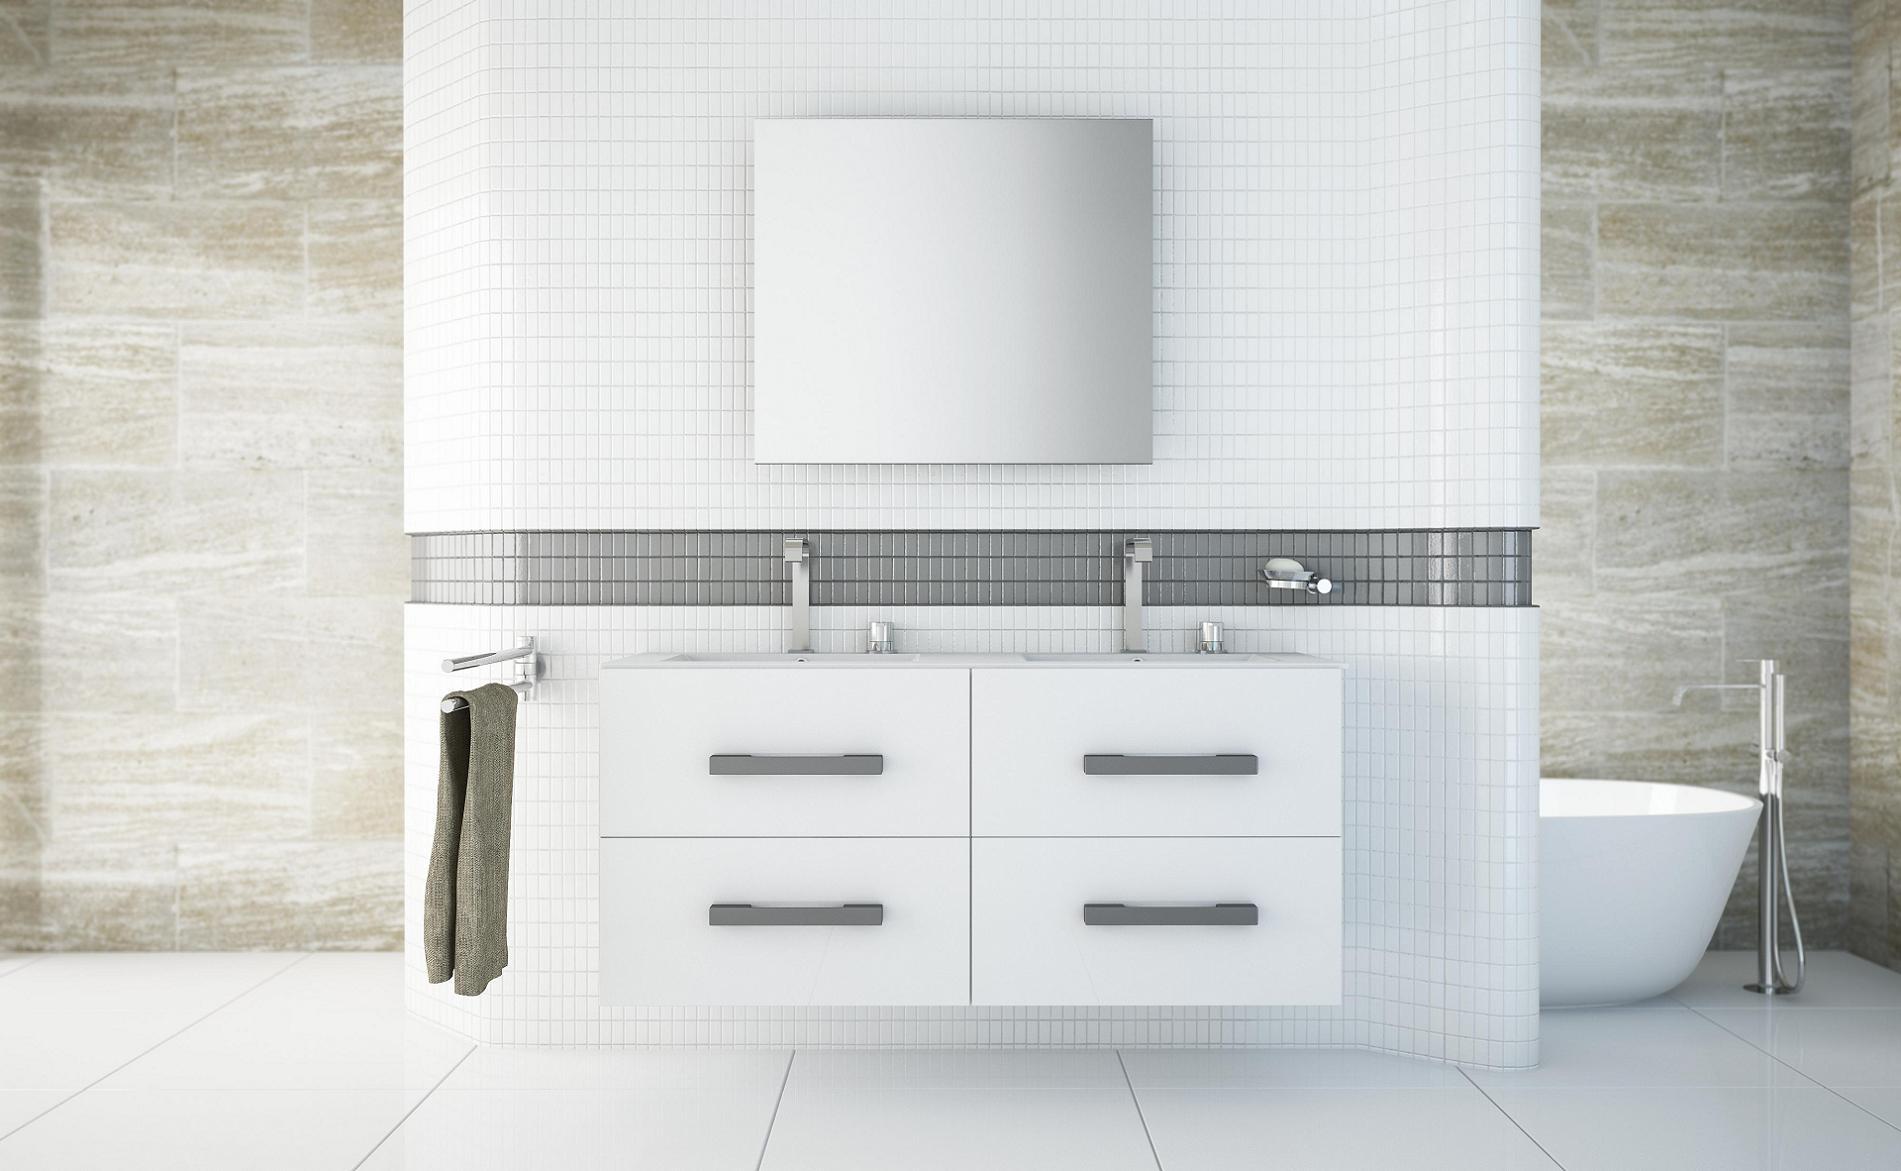 Habitat Meuble De Salle De Bain bianca selection luxe meubles salle de bain pino - gapp habitat